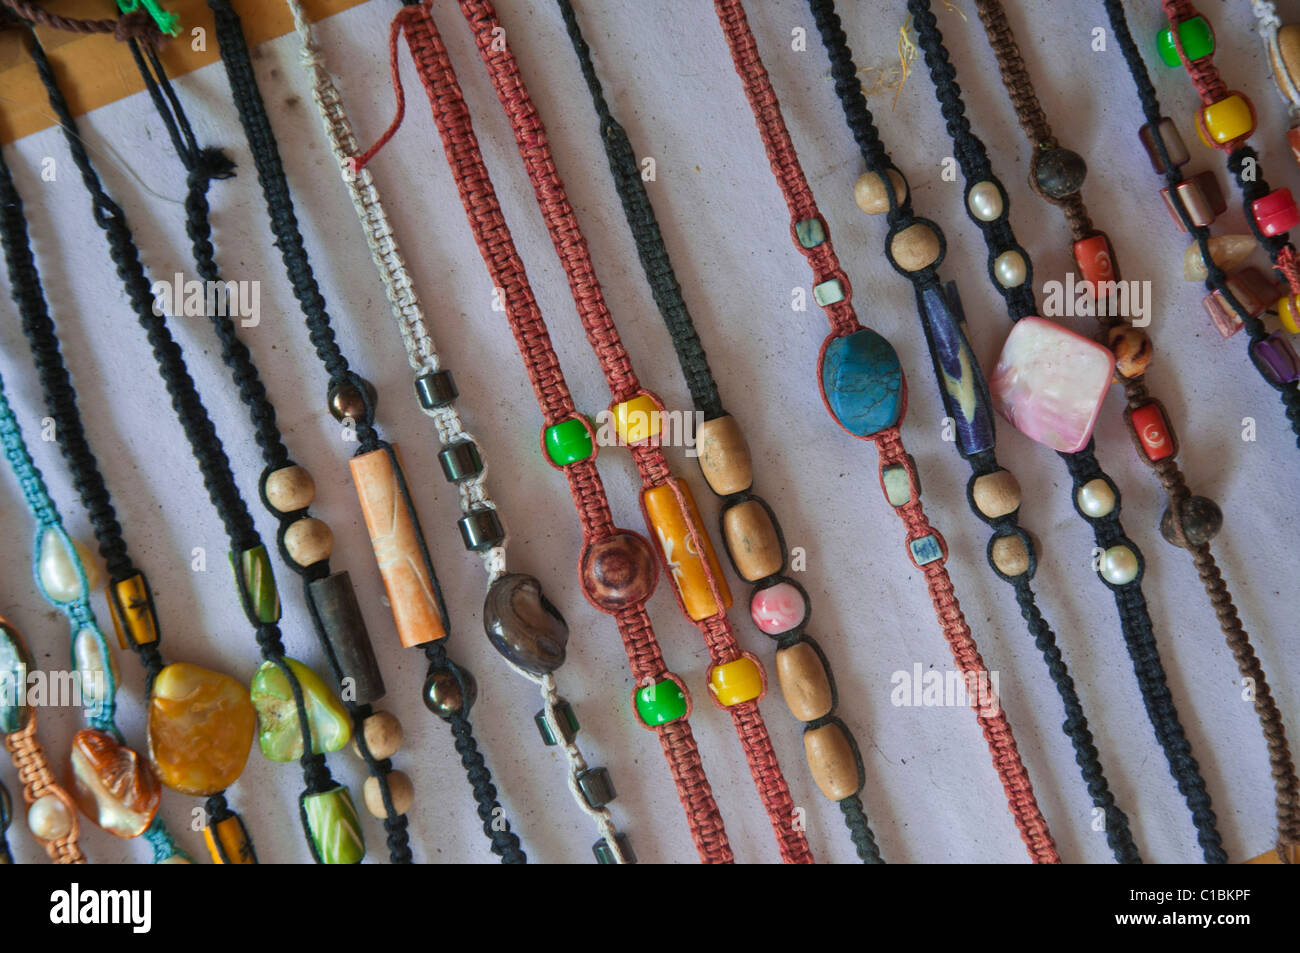 Billige Souvenir Armbänder Angebote in Indonesien Stockbild